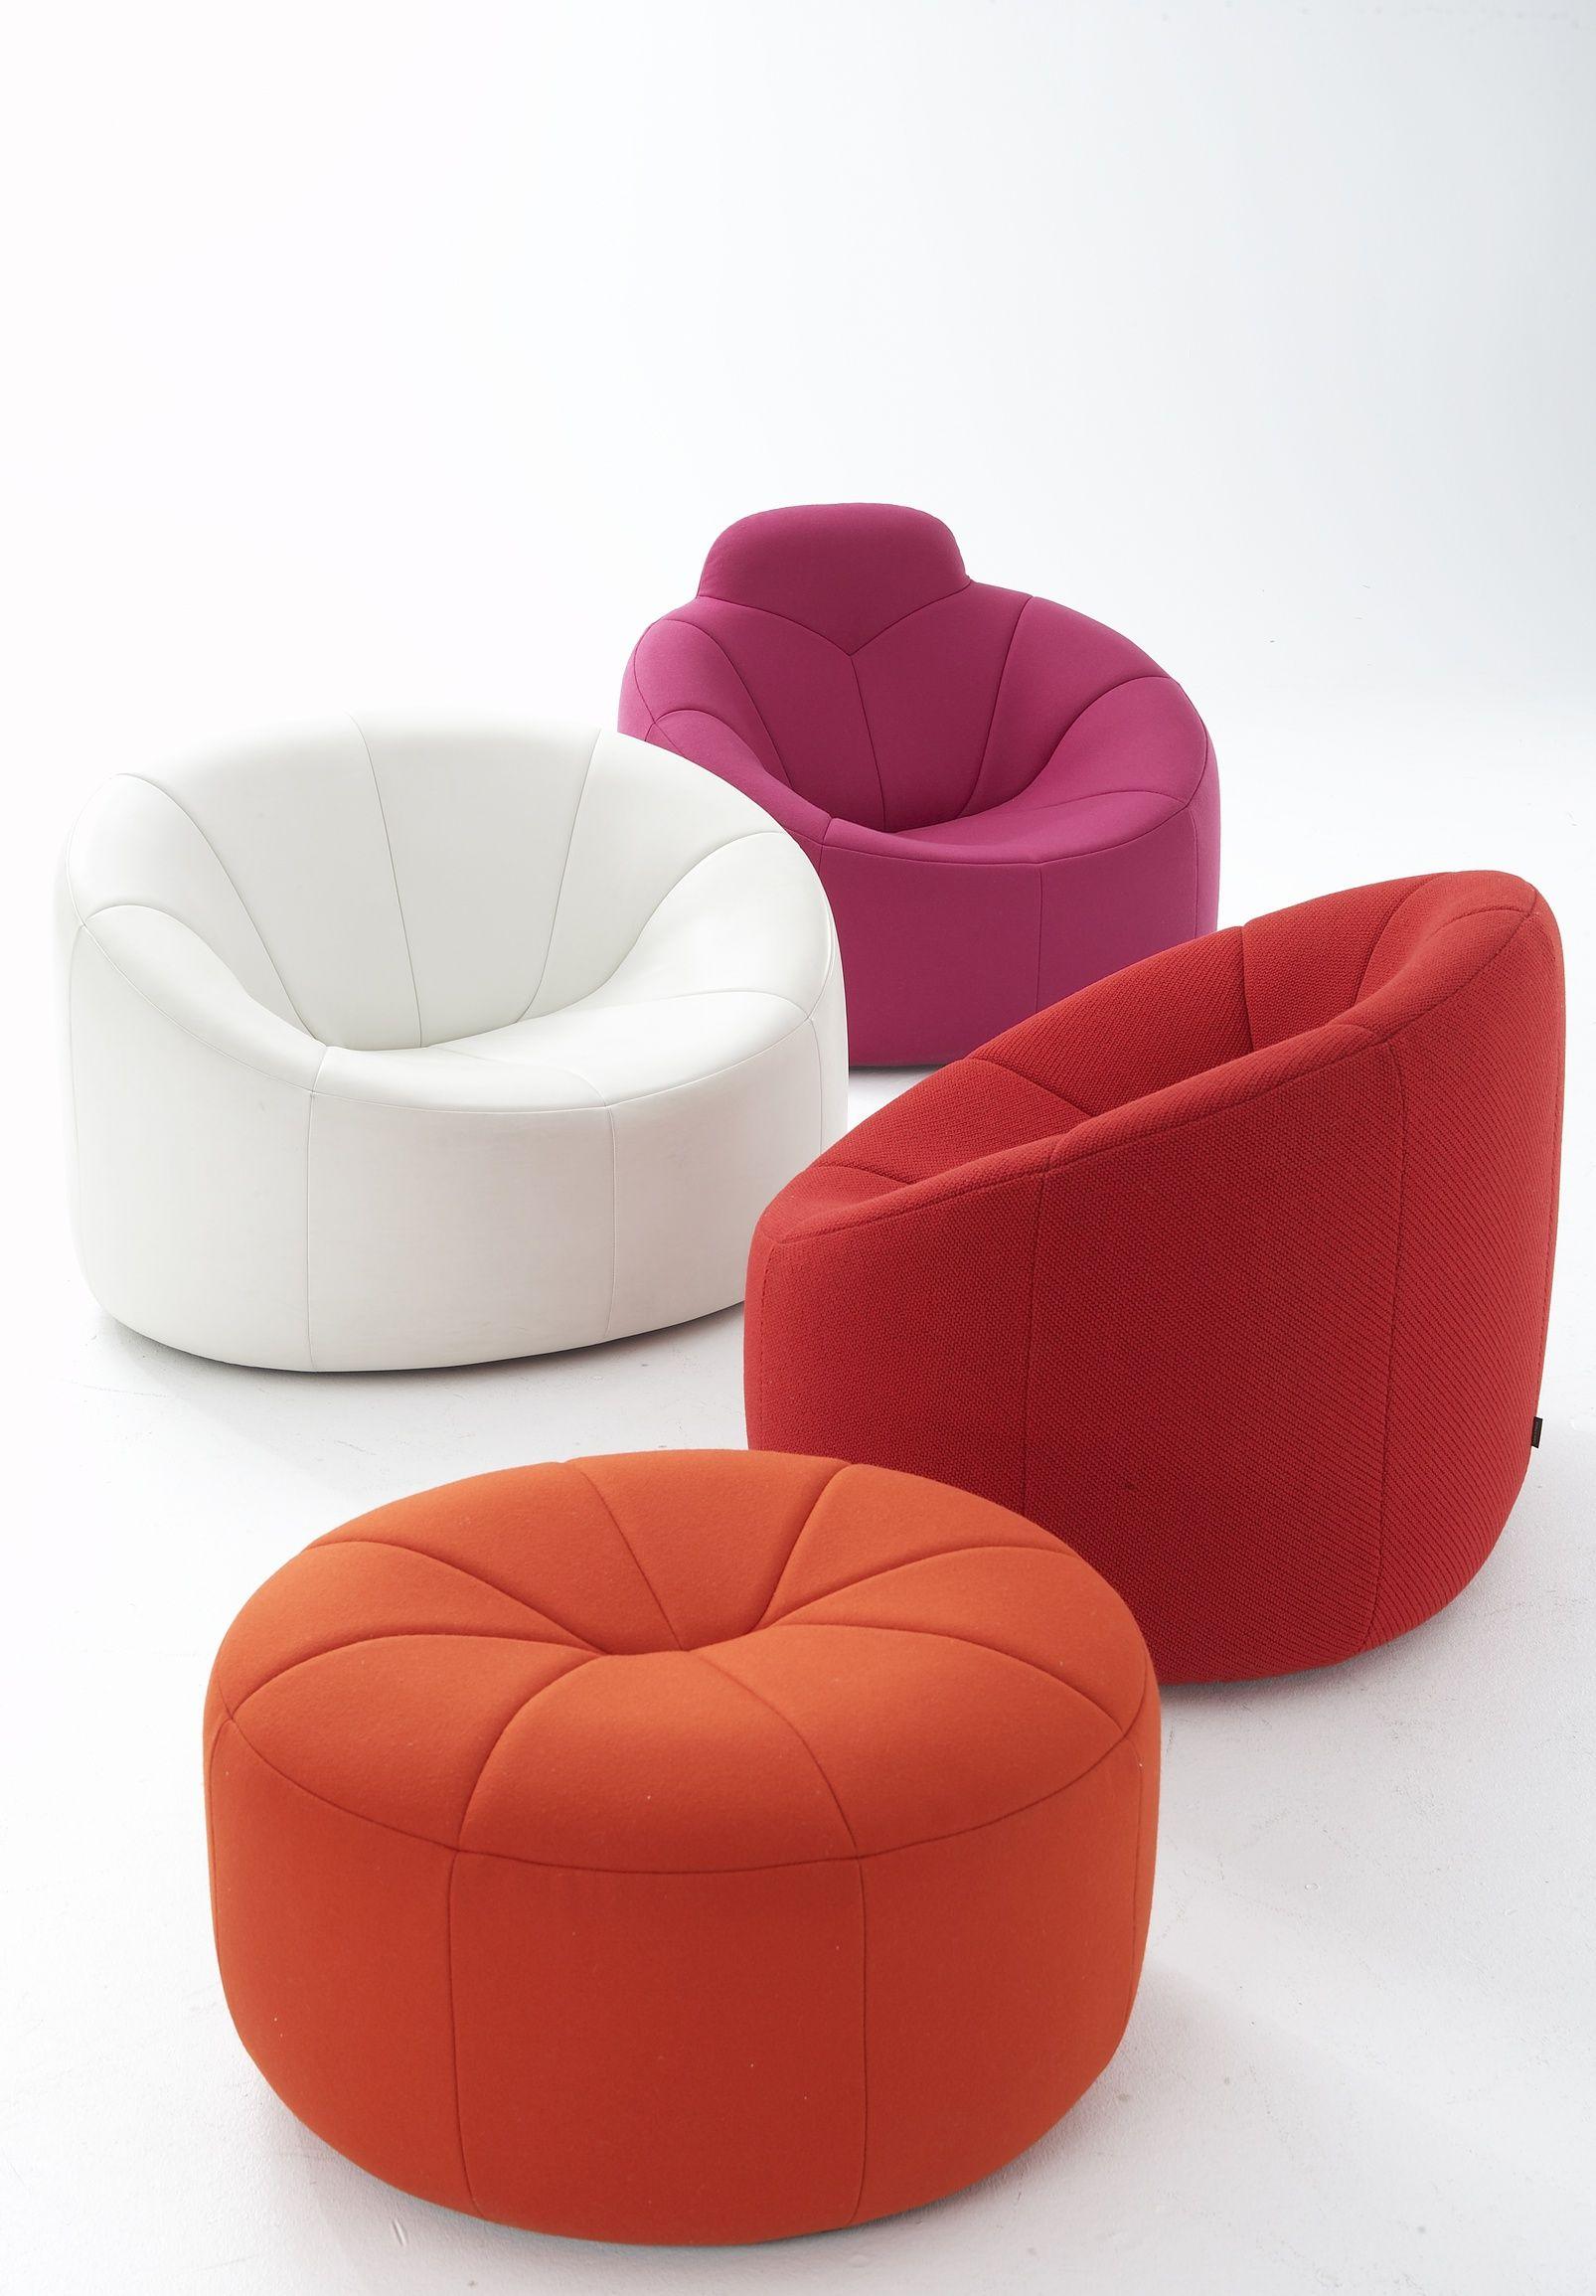 pumpkin fauteuils designer pierre paulin ligne roset. Black Bedroom Furniture Sets. Home Design Ideas